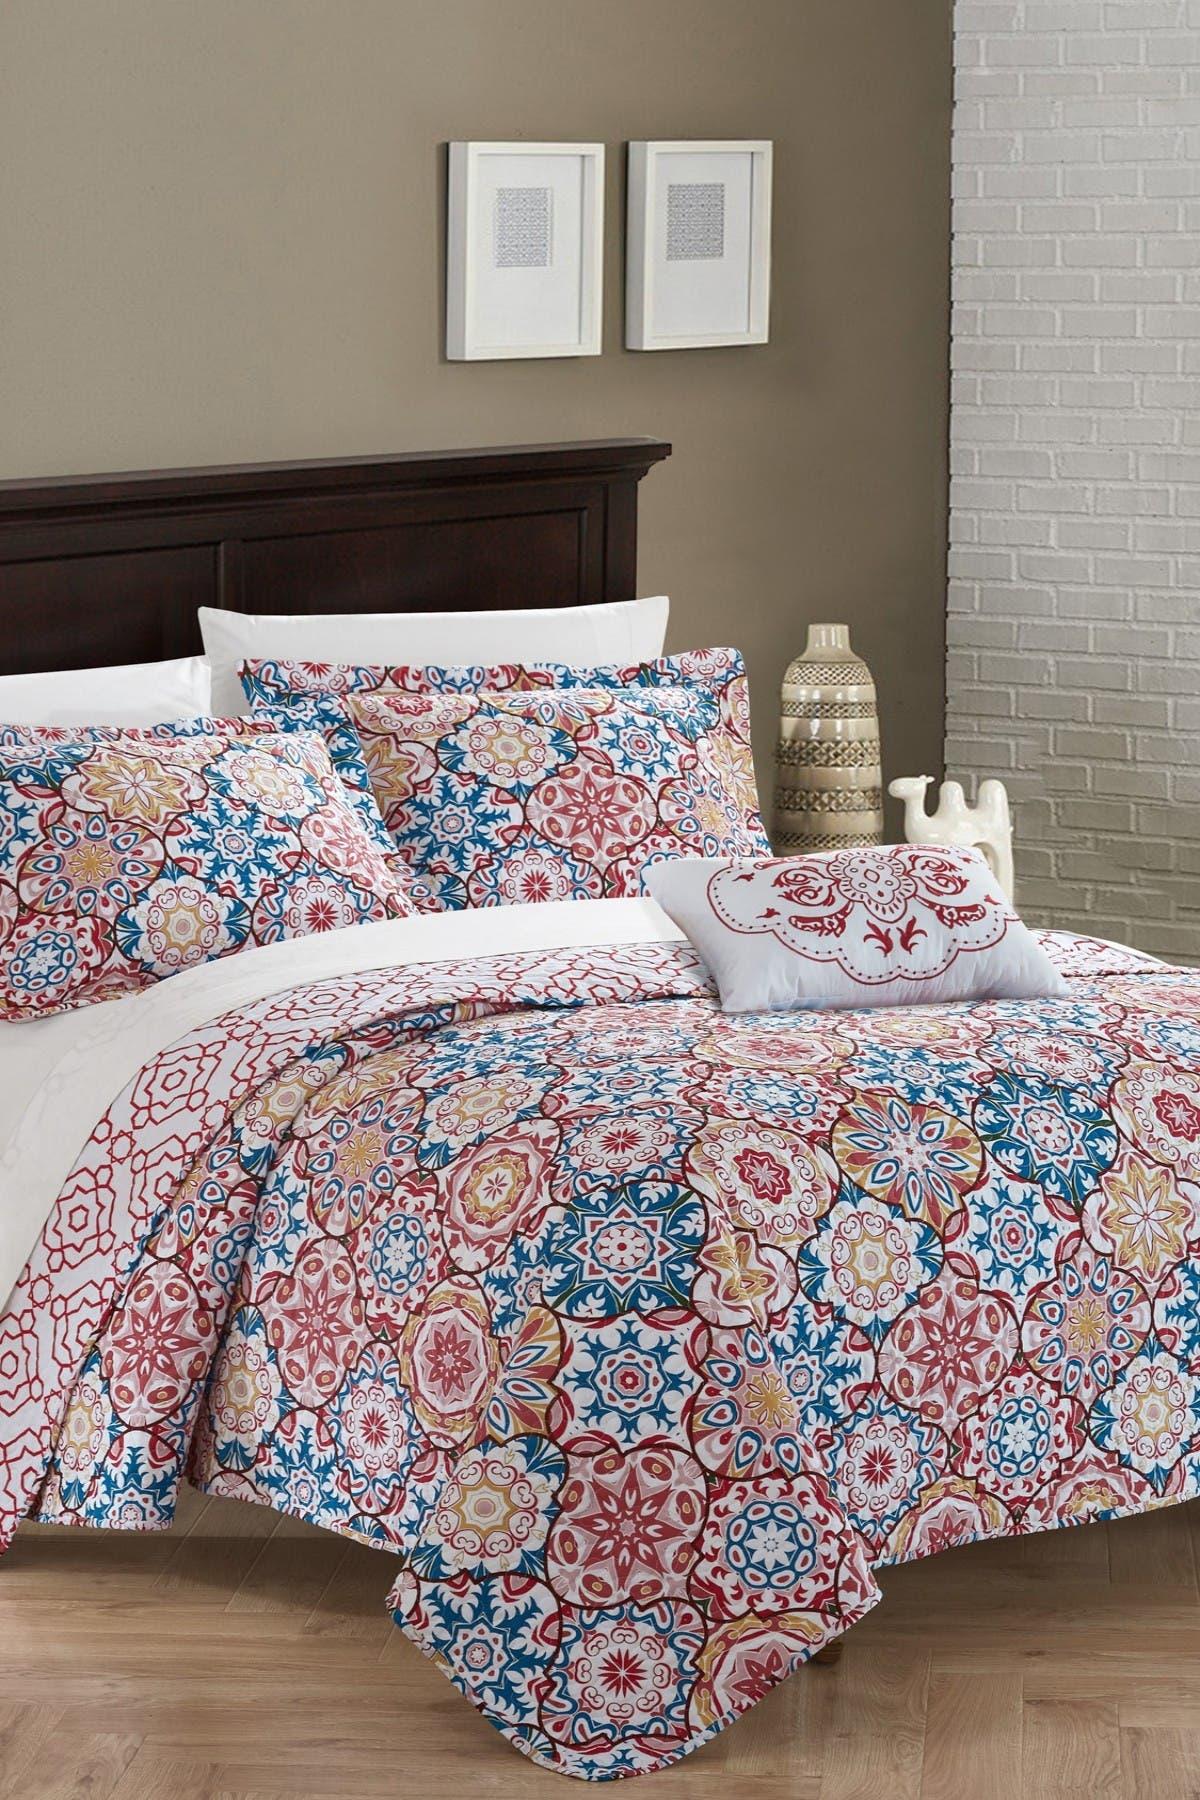 Chic Home Bedding Queen Eindhoven Reversible Quilt Set Pink Nordstrom Rack